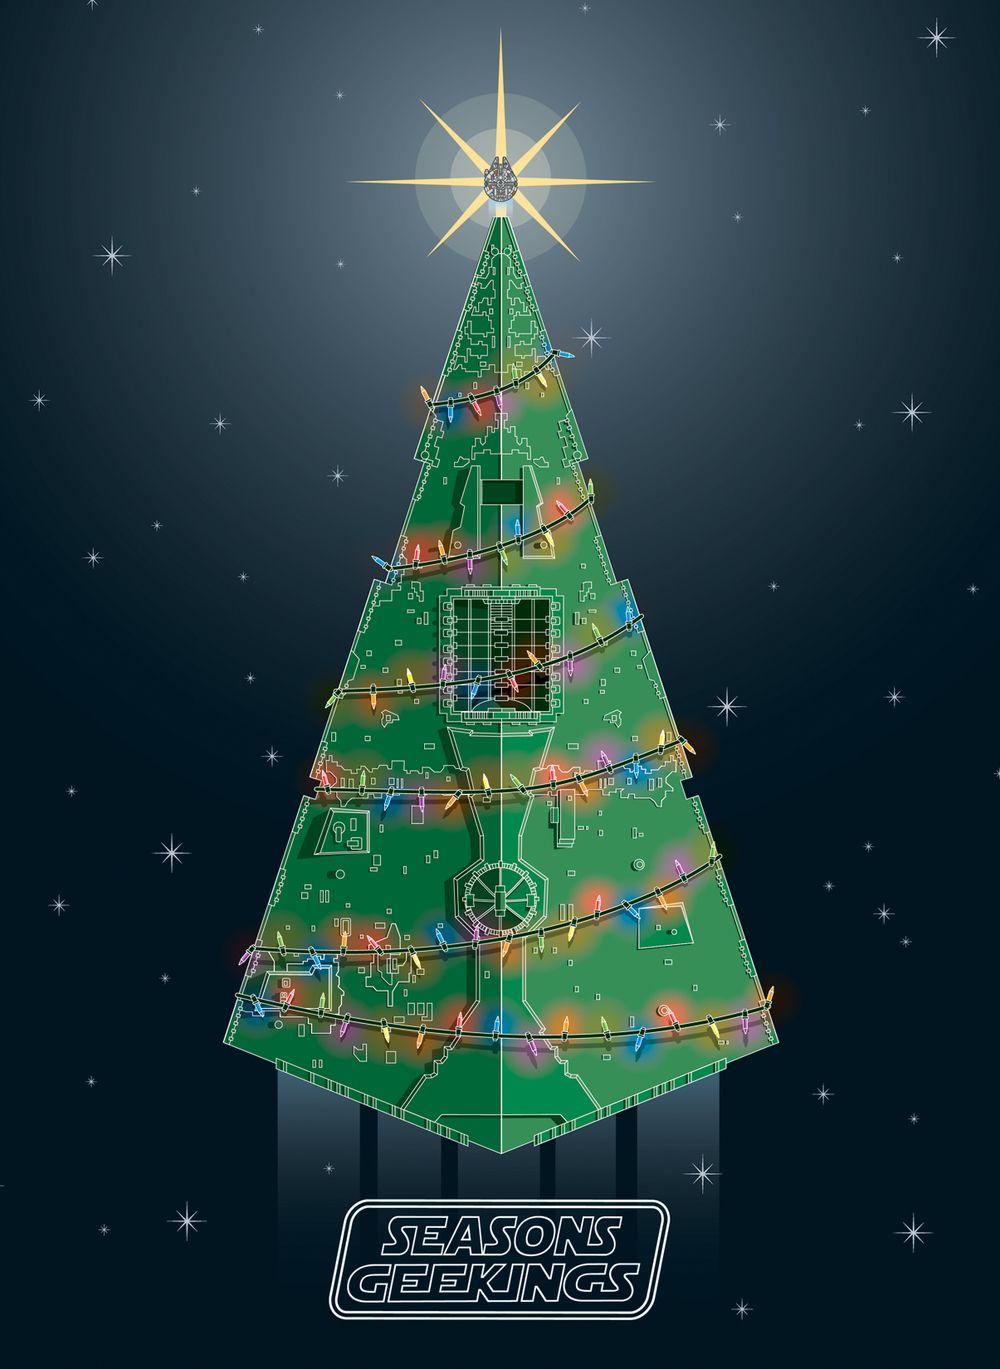 Pin By Carol Gossman On A Sci Fi Christmas Star Wars Awesome Star Wars Christmas Star Wars Wallpaper